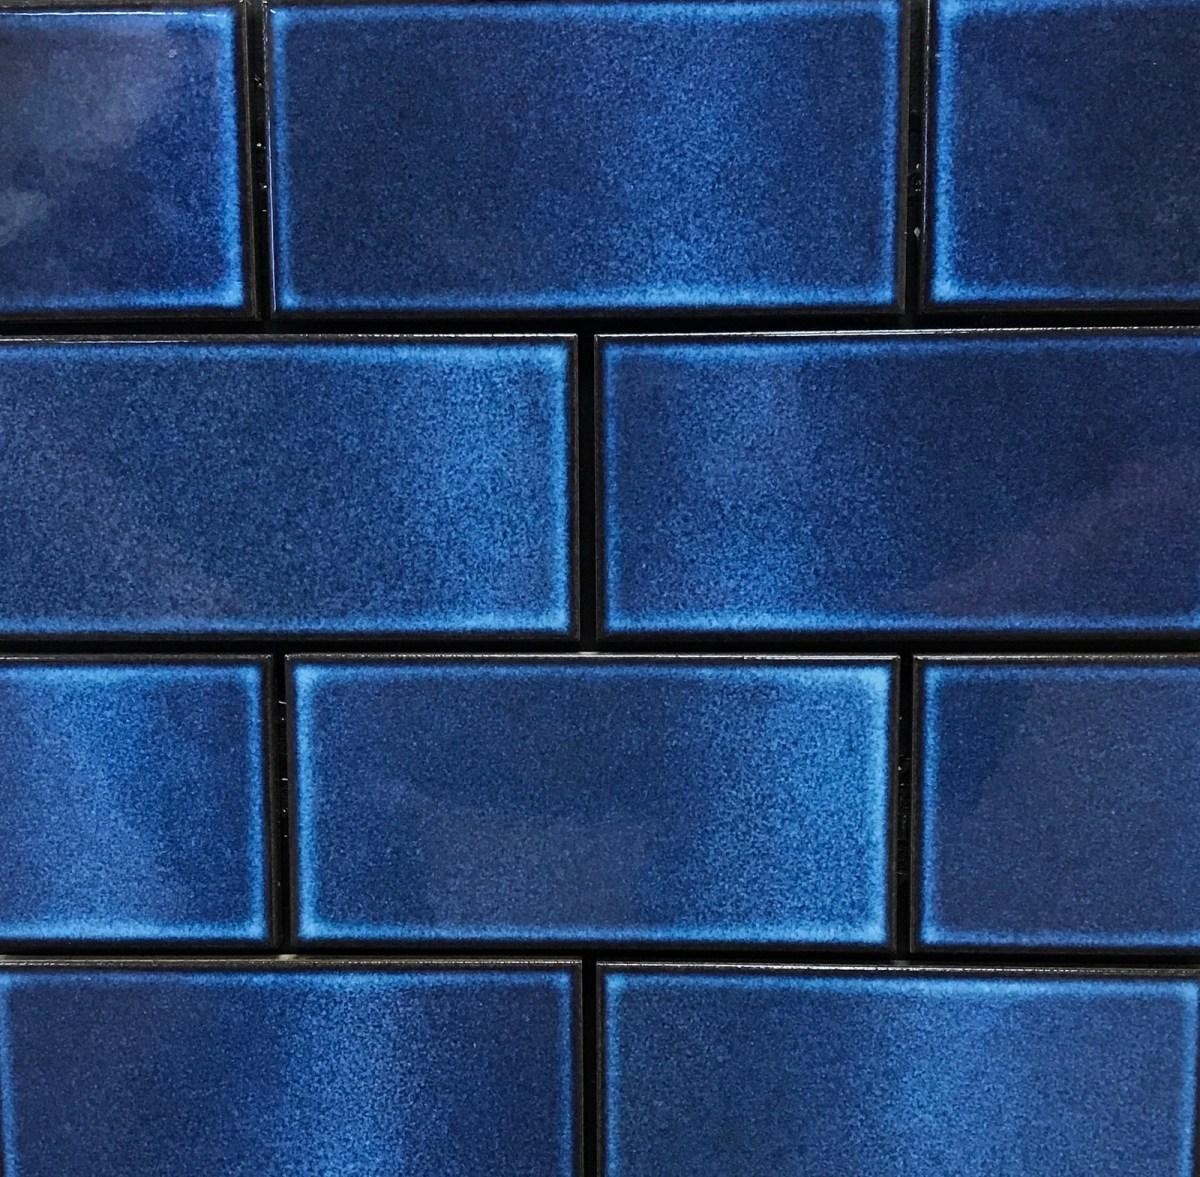 Continental Subway Cos 9 Royal Blue Cepac Tile